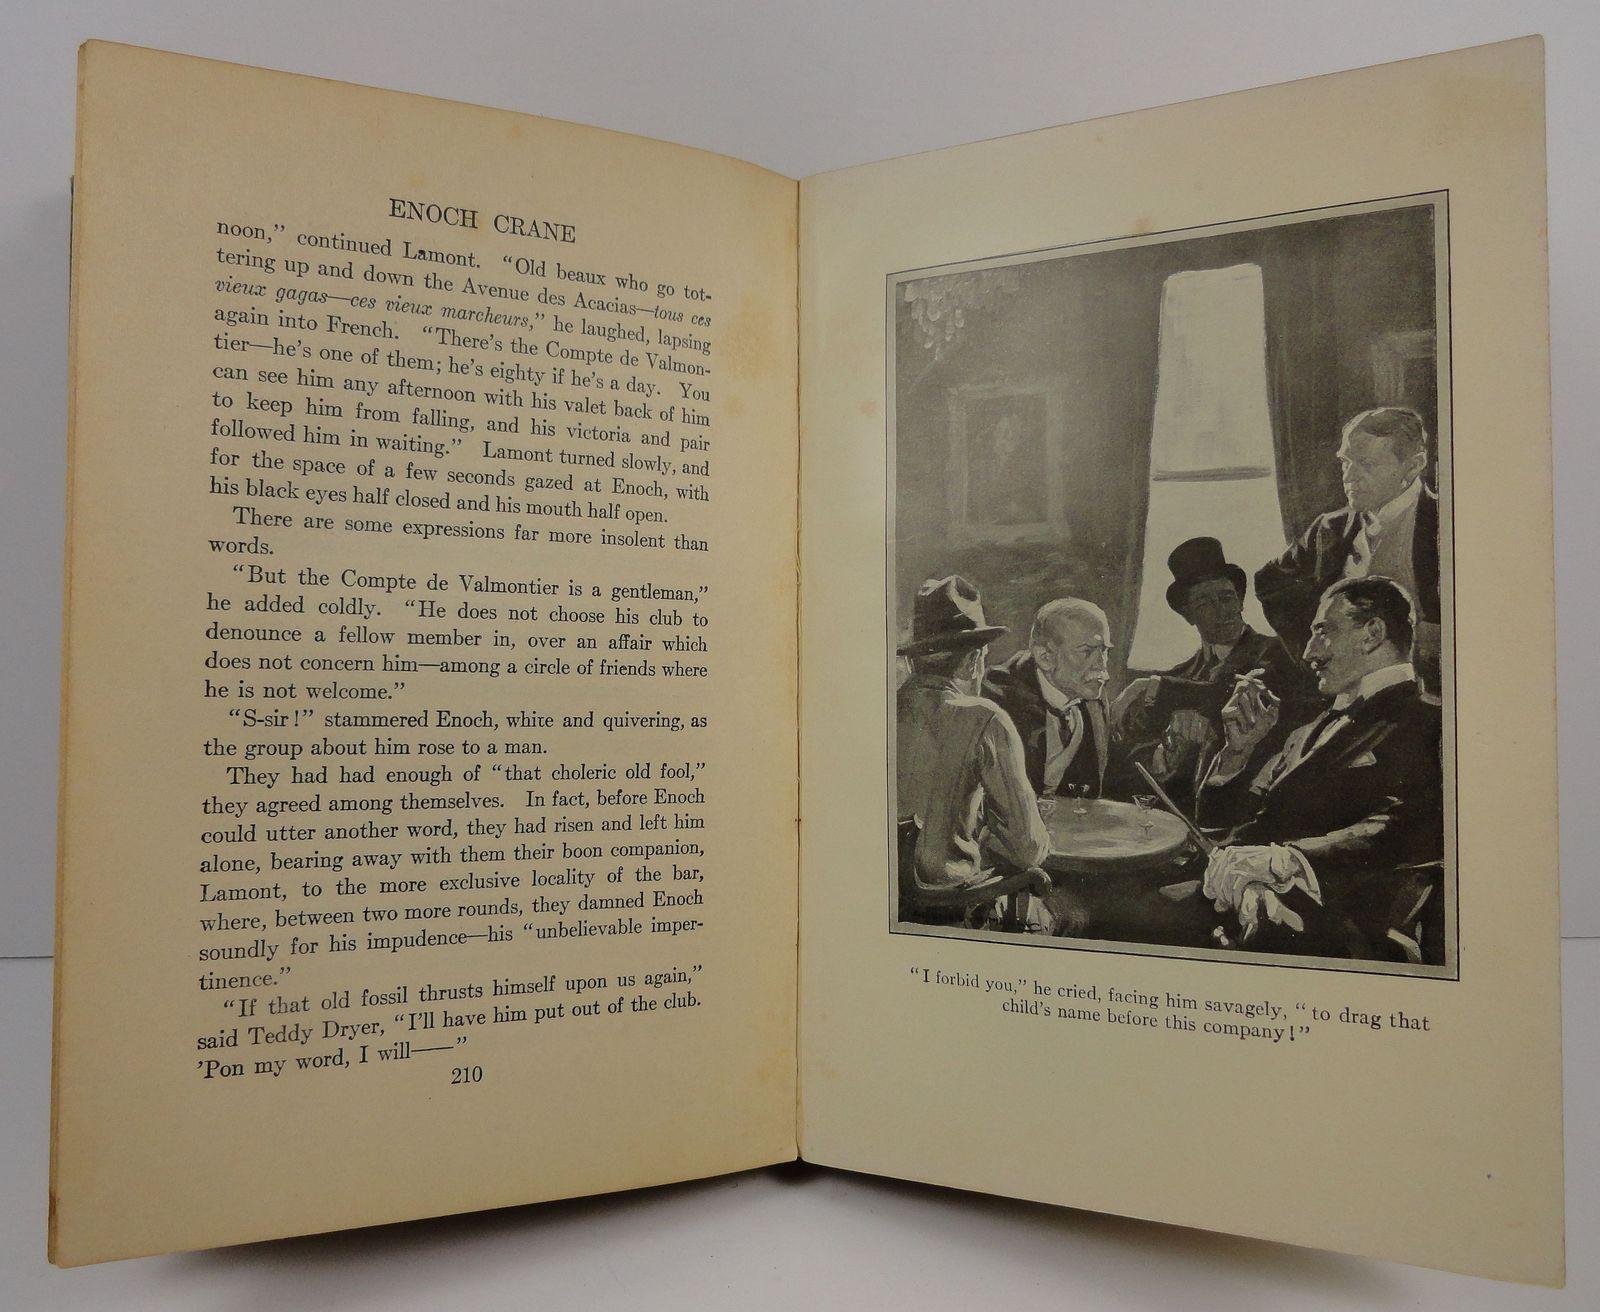 Enoch Crane by F. Berkeley and F. Hopkinson Smith 1916